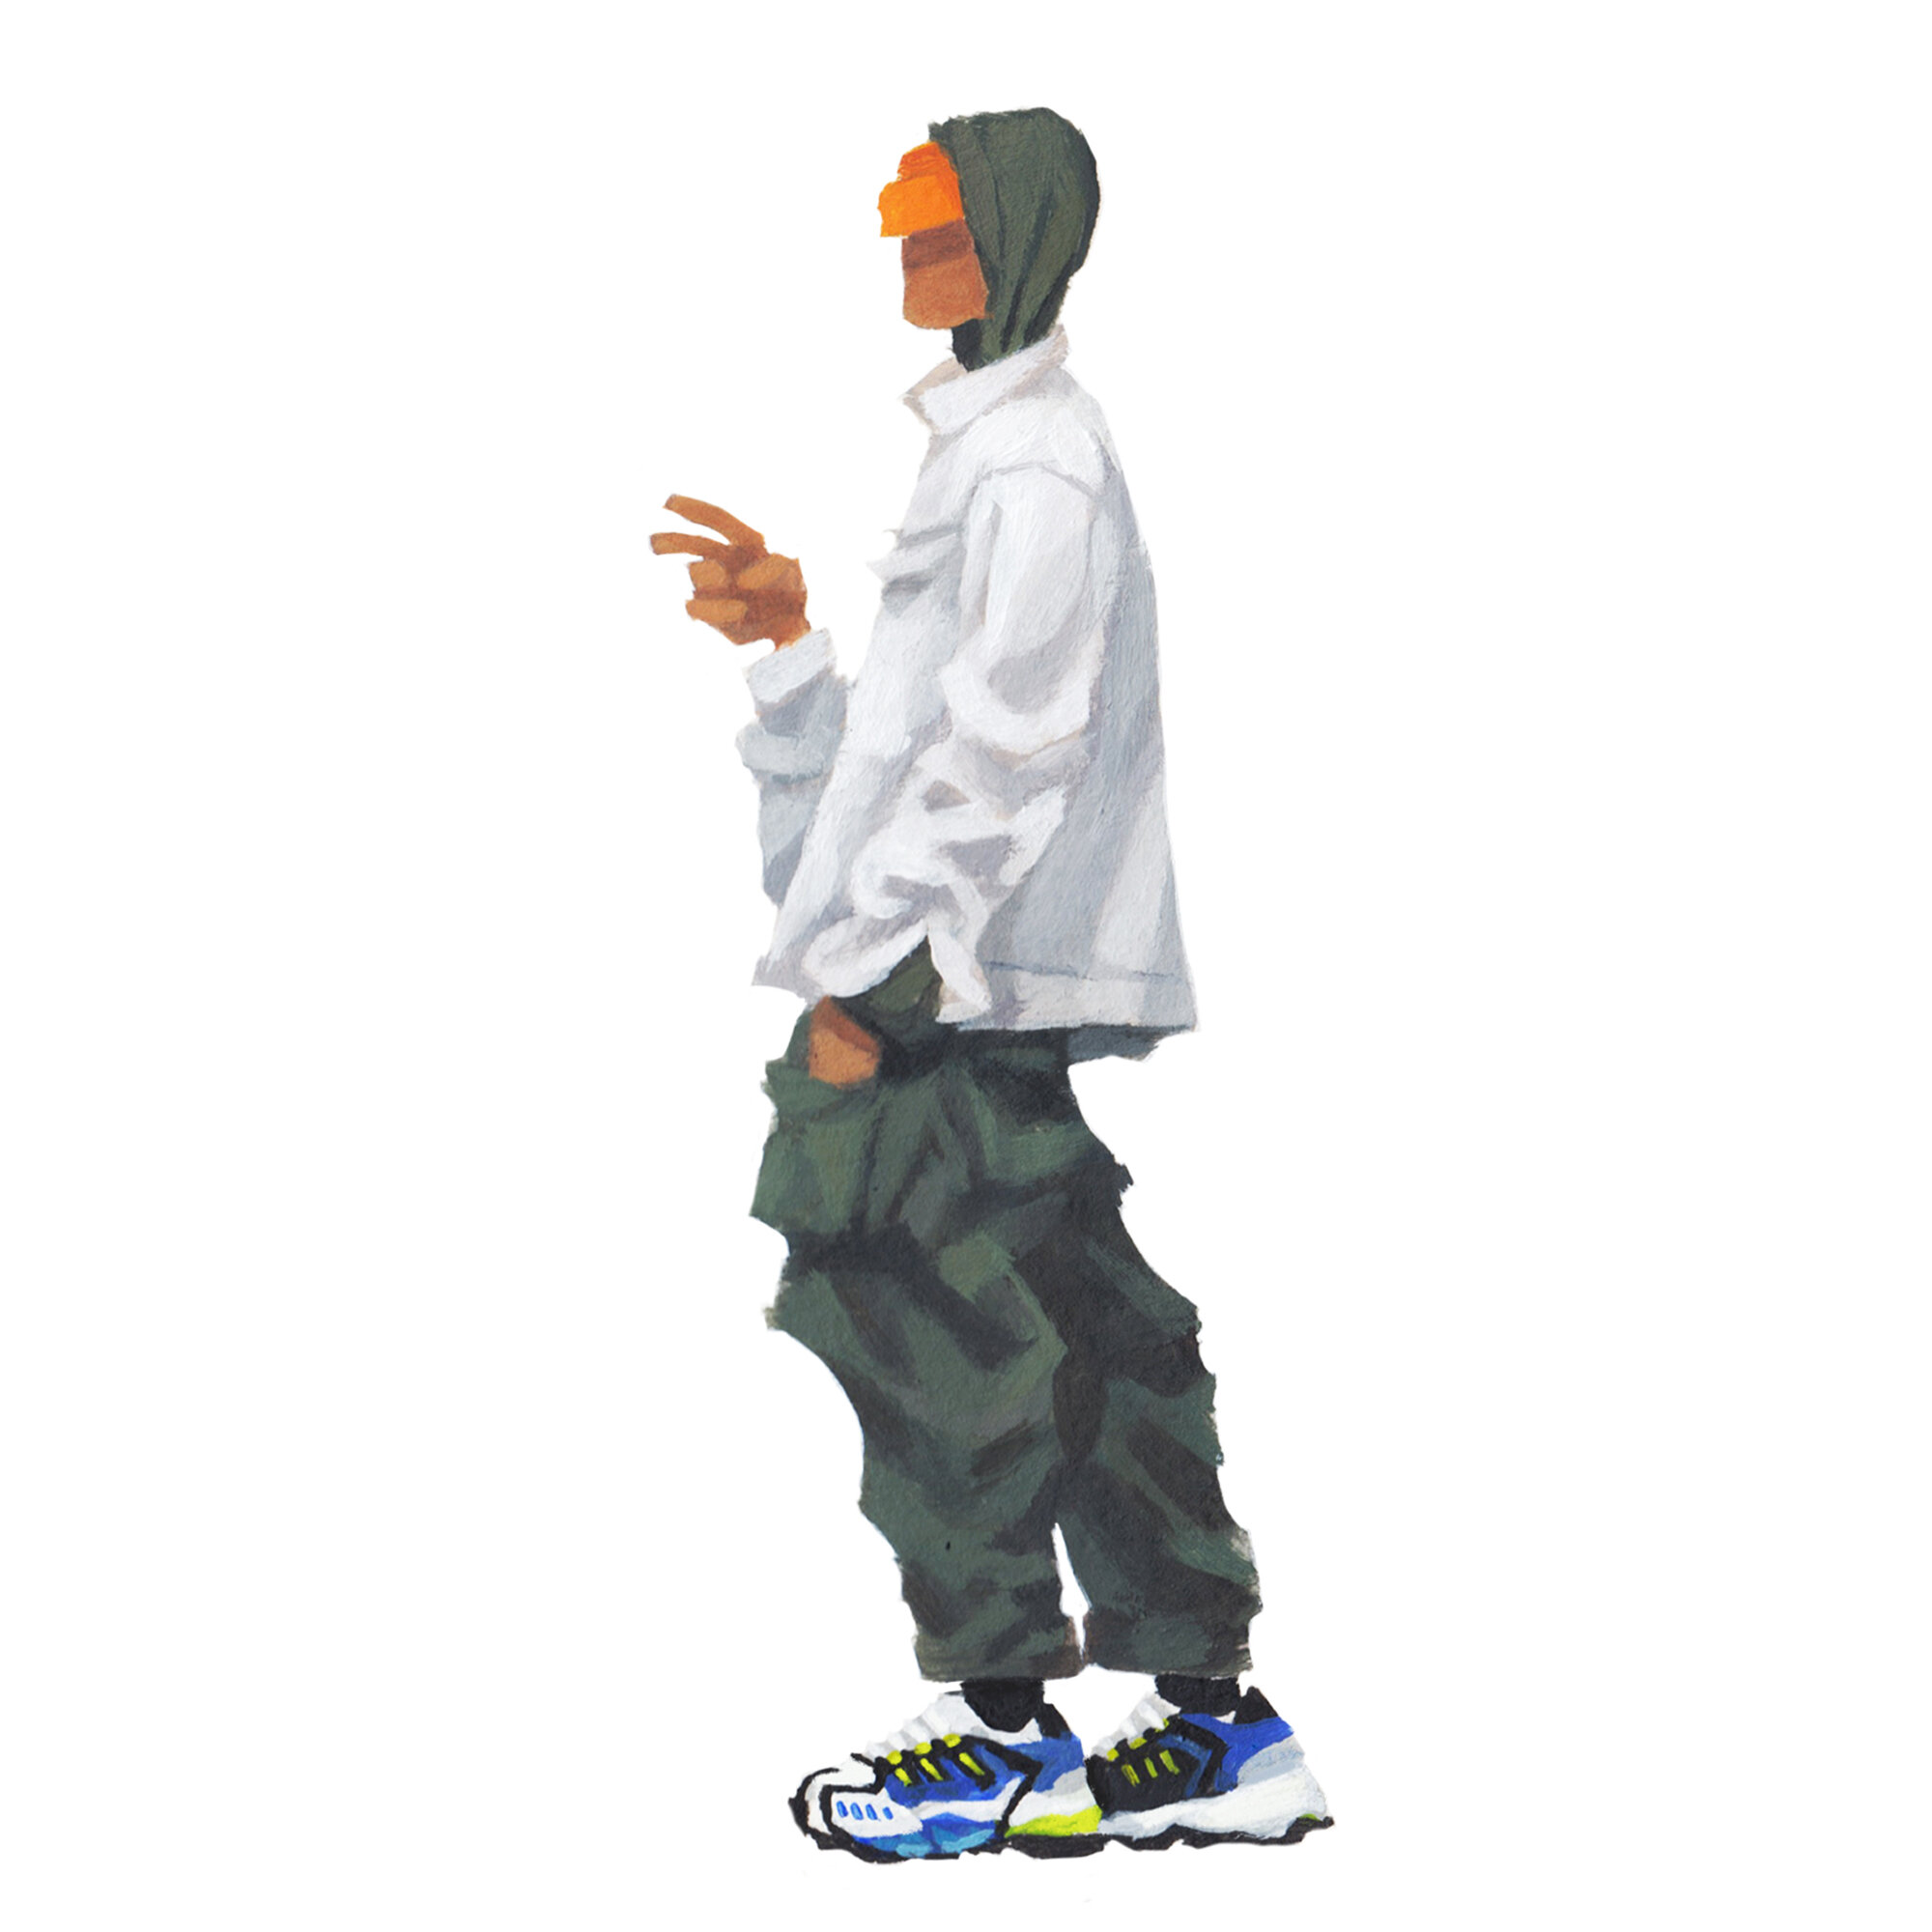 Adidas Torsion_001